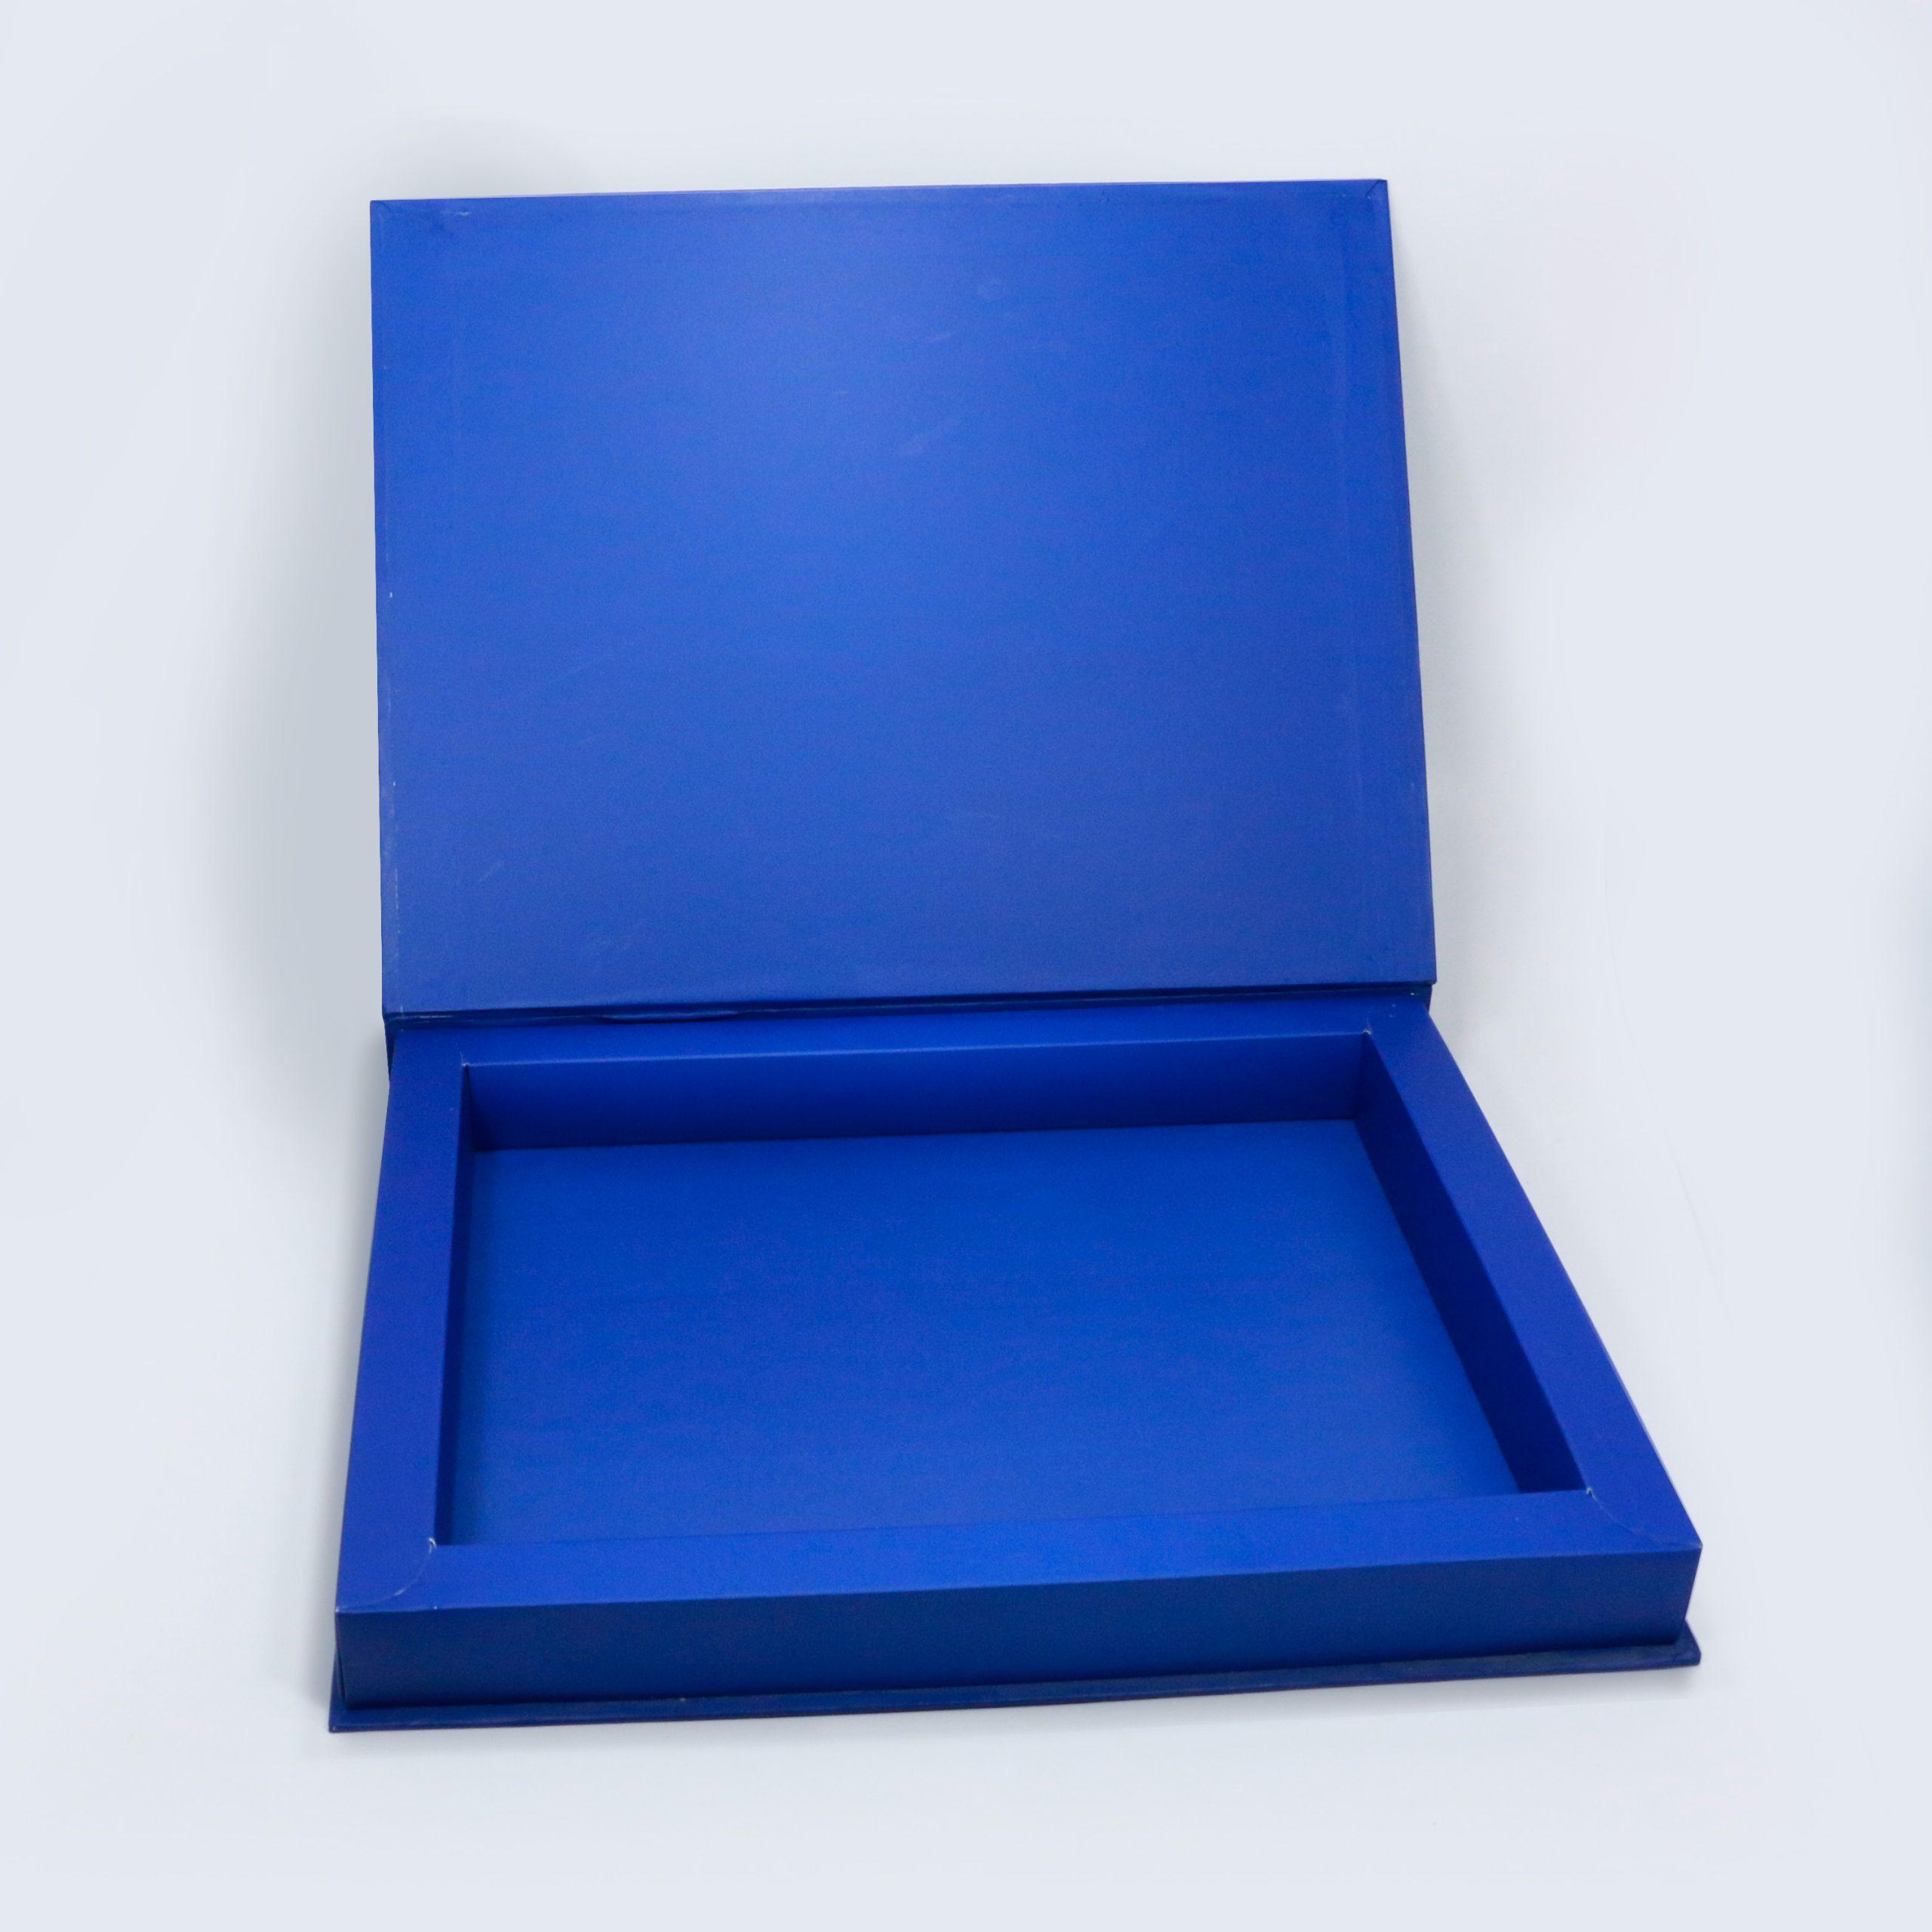 Printing & Packaging Company - Town Crier | Pakistan | India | Bangladesh | Cambodia | SriLanka | Russia | Moscow | St Petersburg | Ukraine | Belarus | Kazakhstan | Uzbekistan | Kyrgyzstan | Turkmenistan | Poland | Romania | Finland | Italy | Germany | Uganda | Sodan | Kenya | Customized Boxes | Apparel Packaging Boxes | Sport goodPharmaceutical Packaging Boxes | Garment Packaging Boxes | Soap Boxes| Pillow Boxes | Candle Boxes | Paper Bags | Cosmetics Packaging Boxes | Rigid Boxes | Paperboard Boxes | Corrugated Boxes | Kraft Boxes